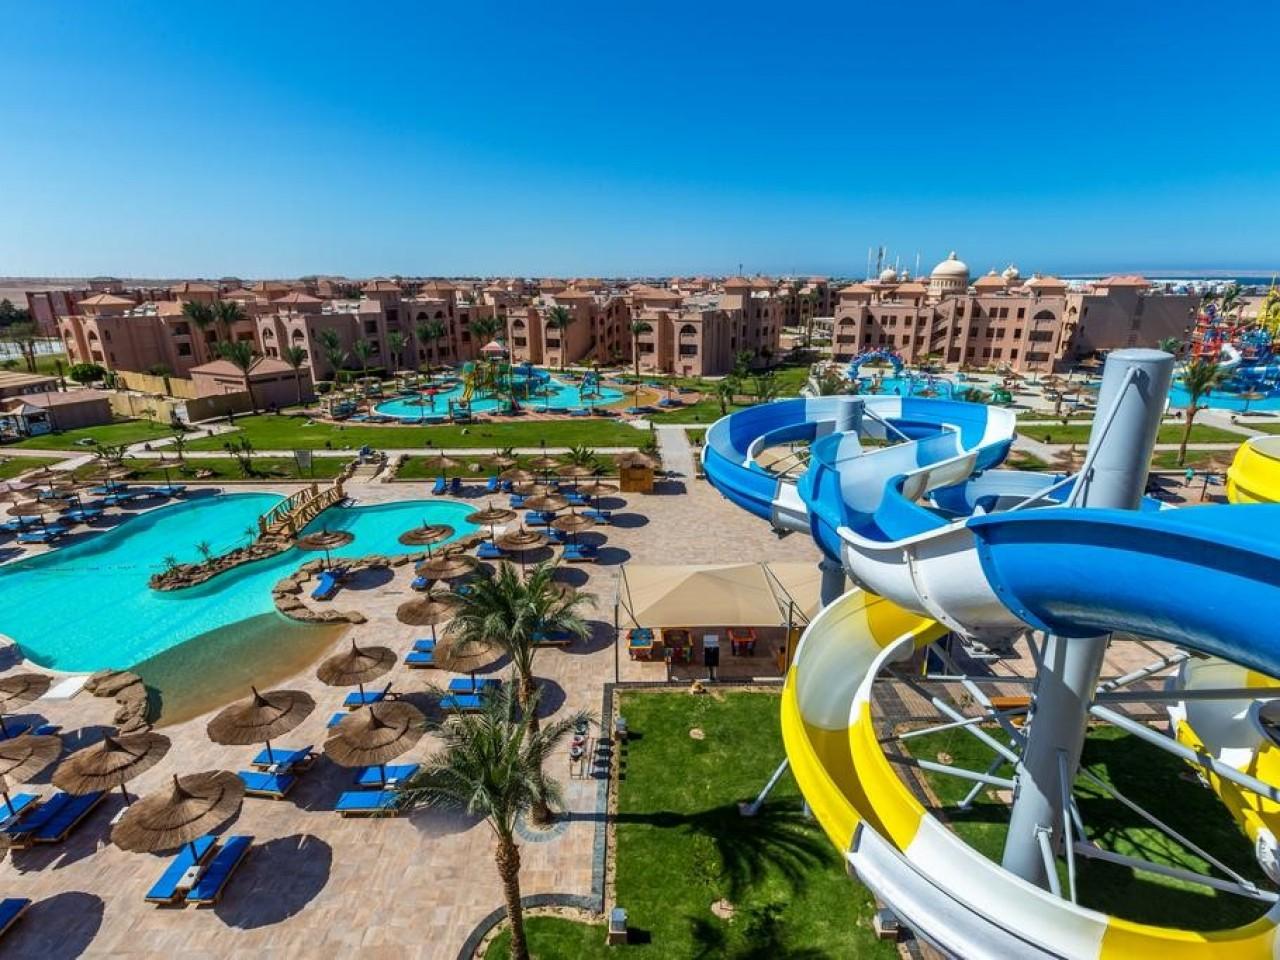 WINTER STAYCATION: Albatros Aqua Park Resort, Hurghada